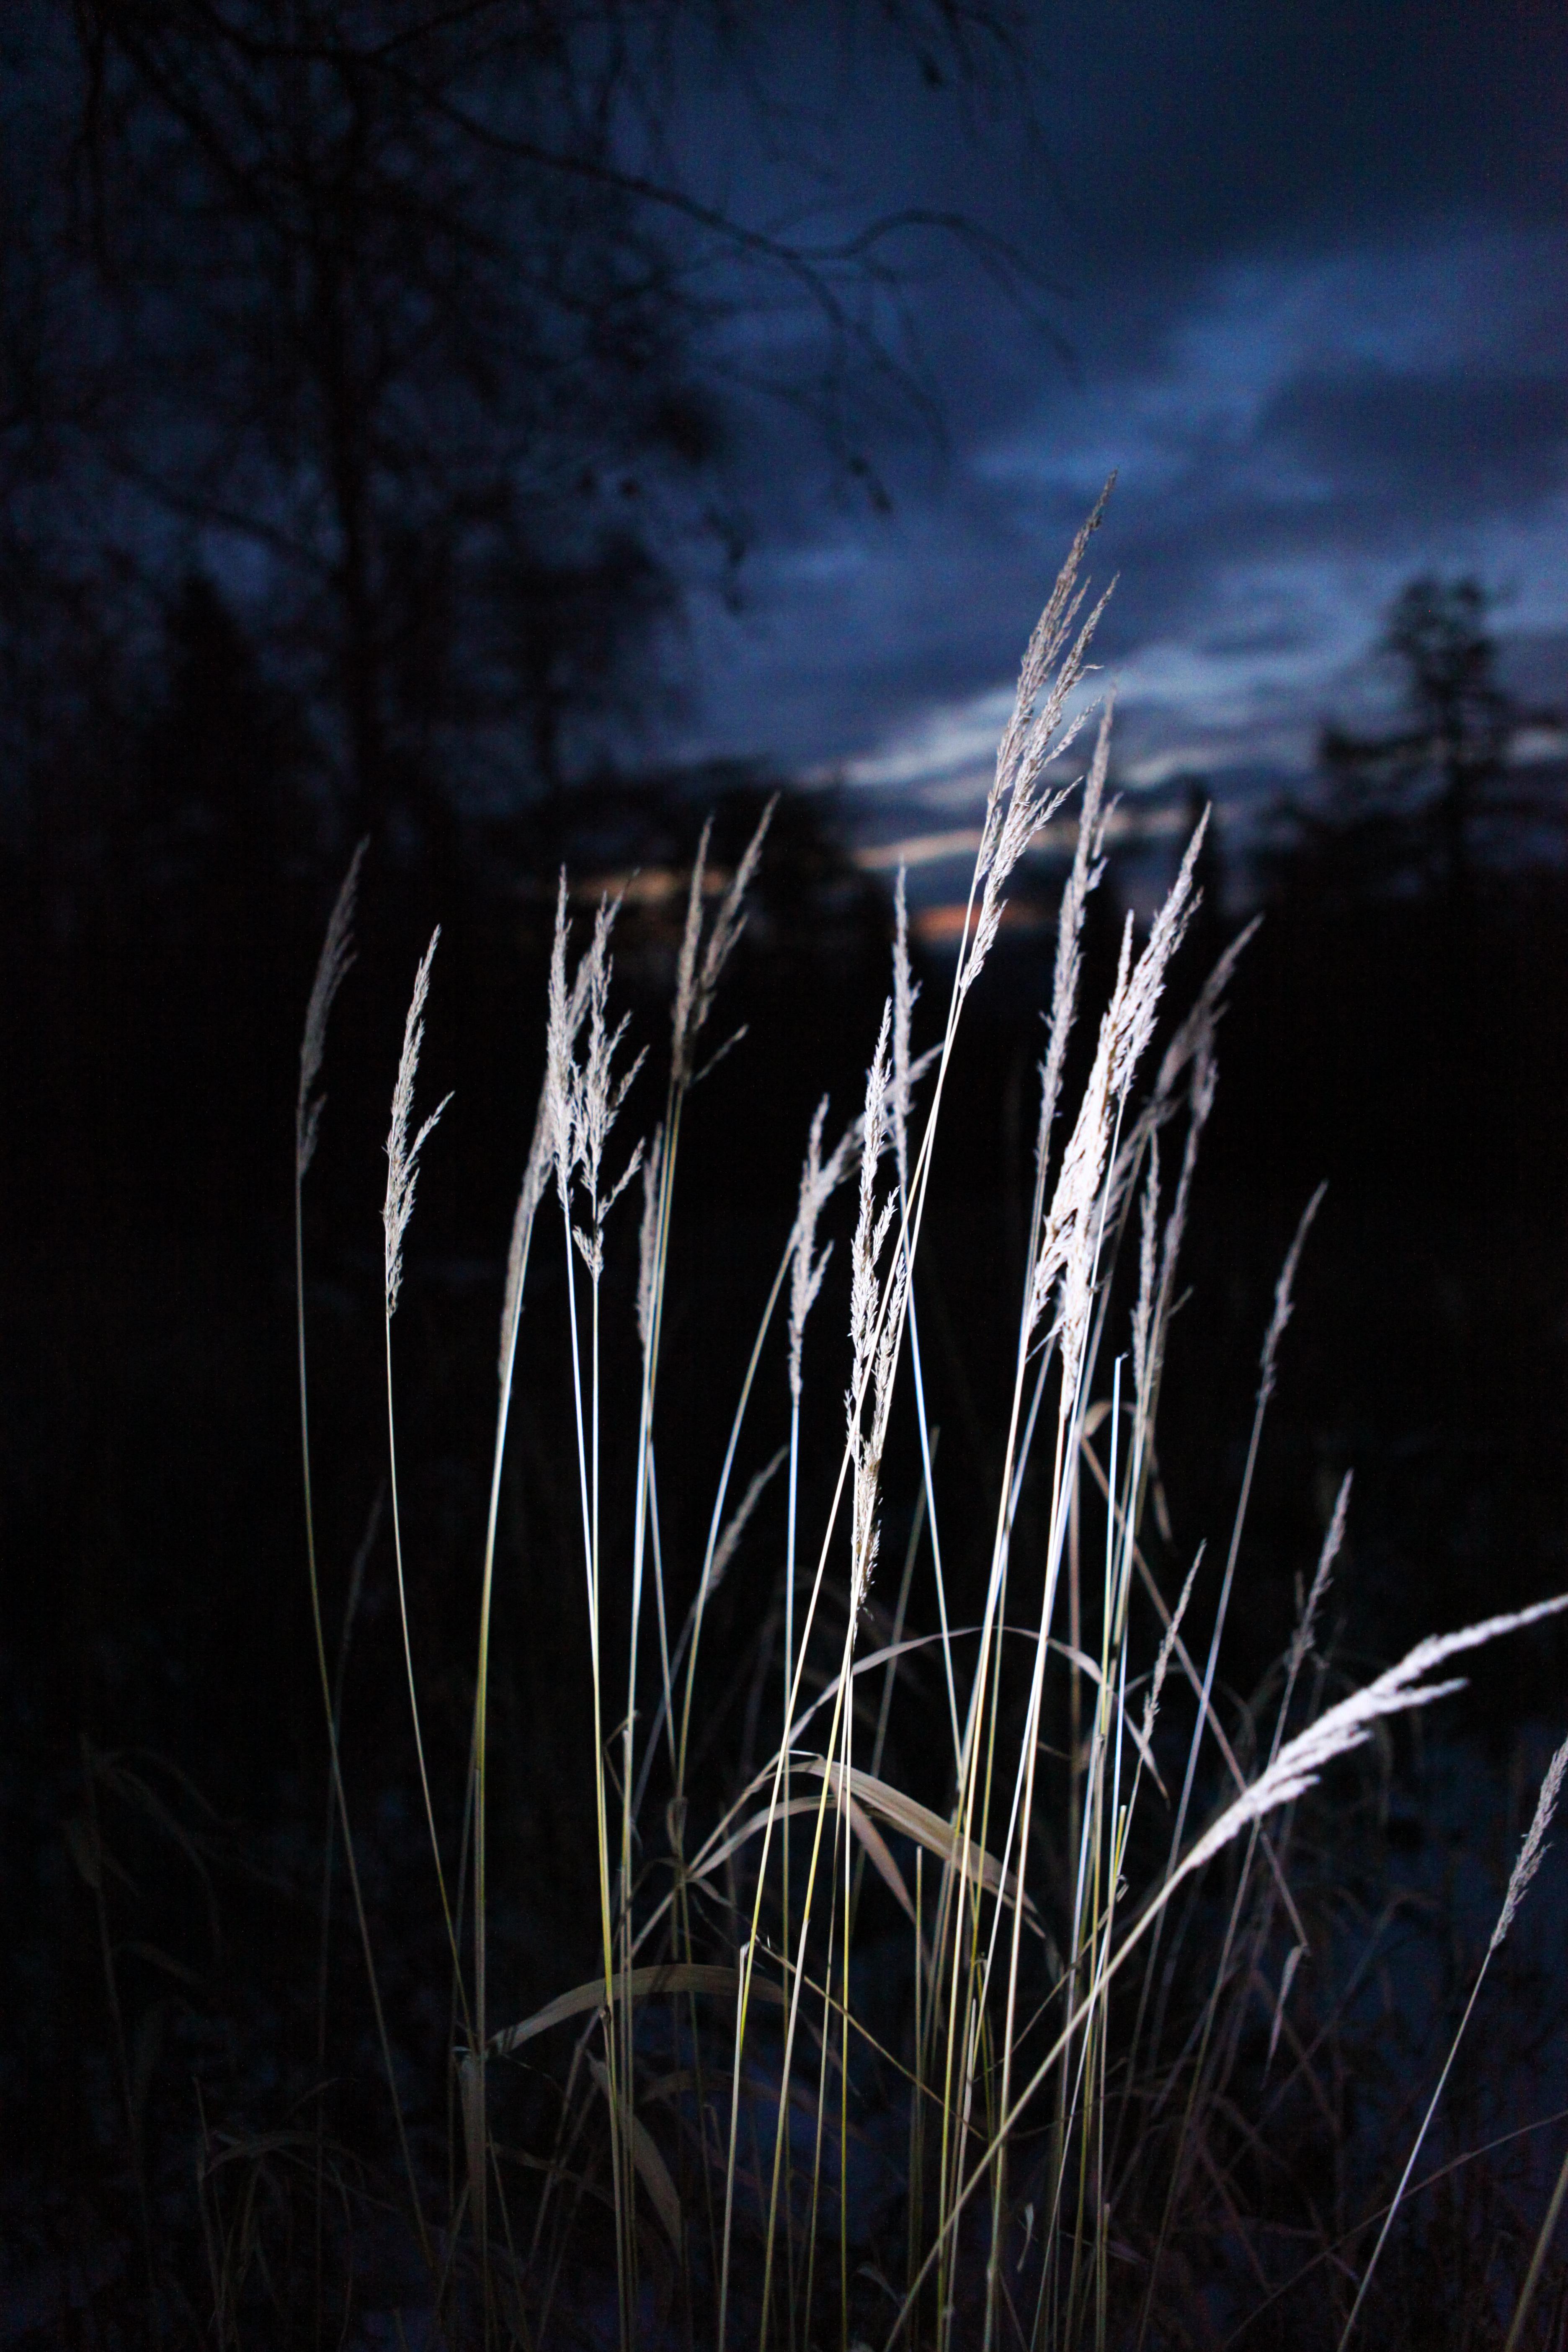 Plant, Dark, Dusk, Gloomy, Grass, HQ Photo